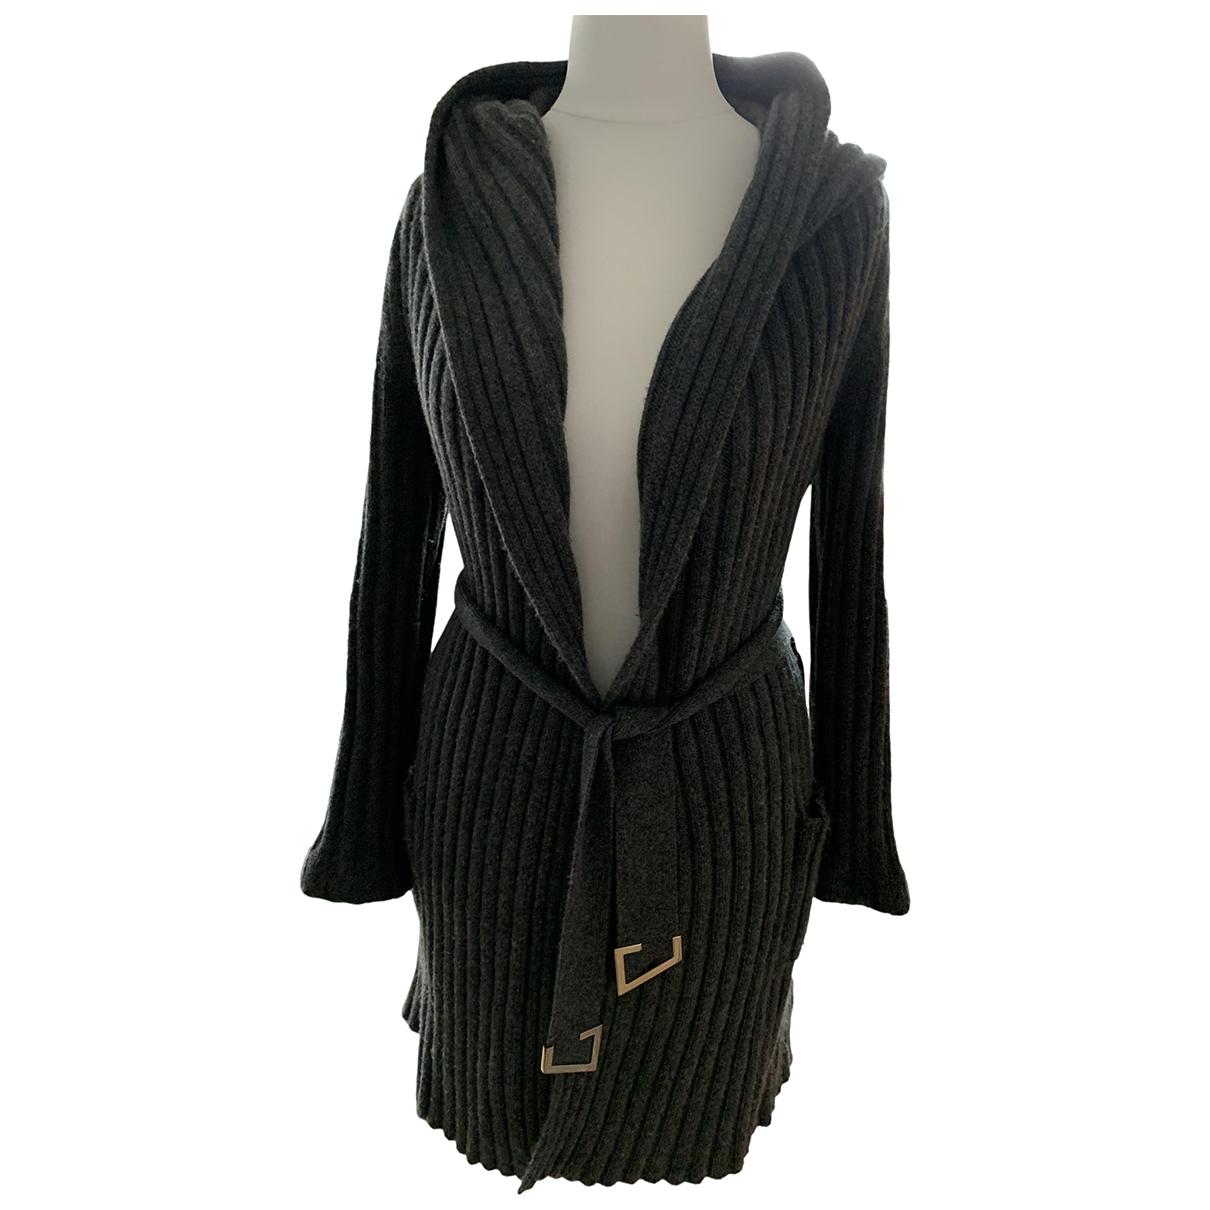 Gucci \N Grey Cashmere jacket for Women S International